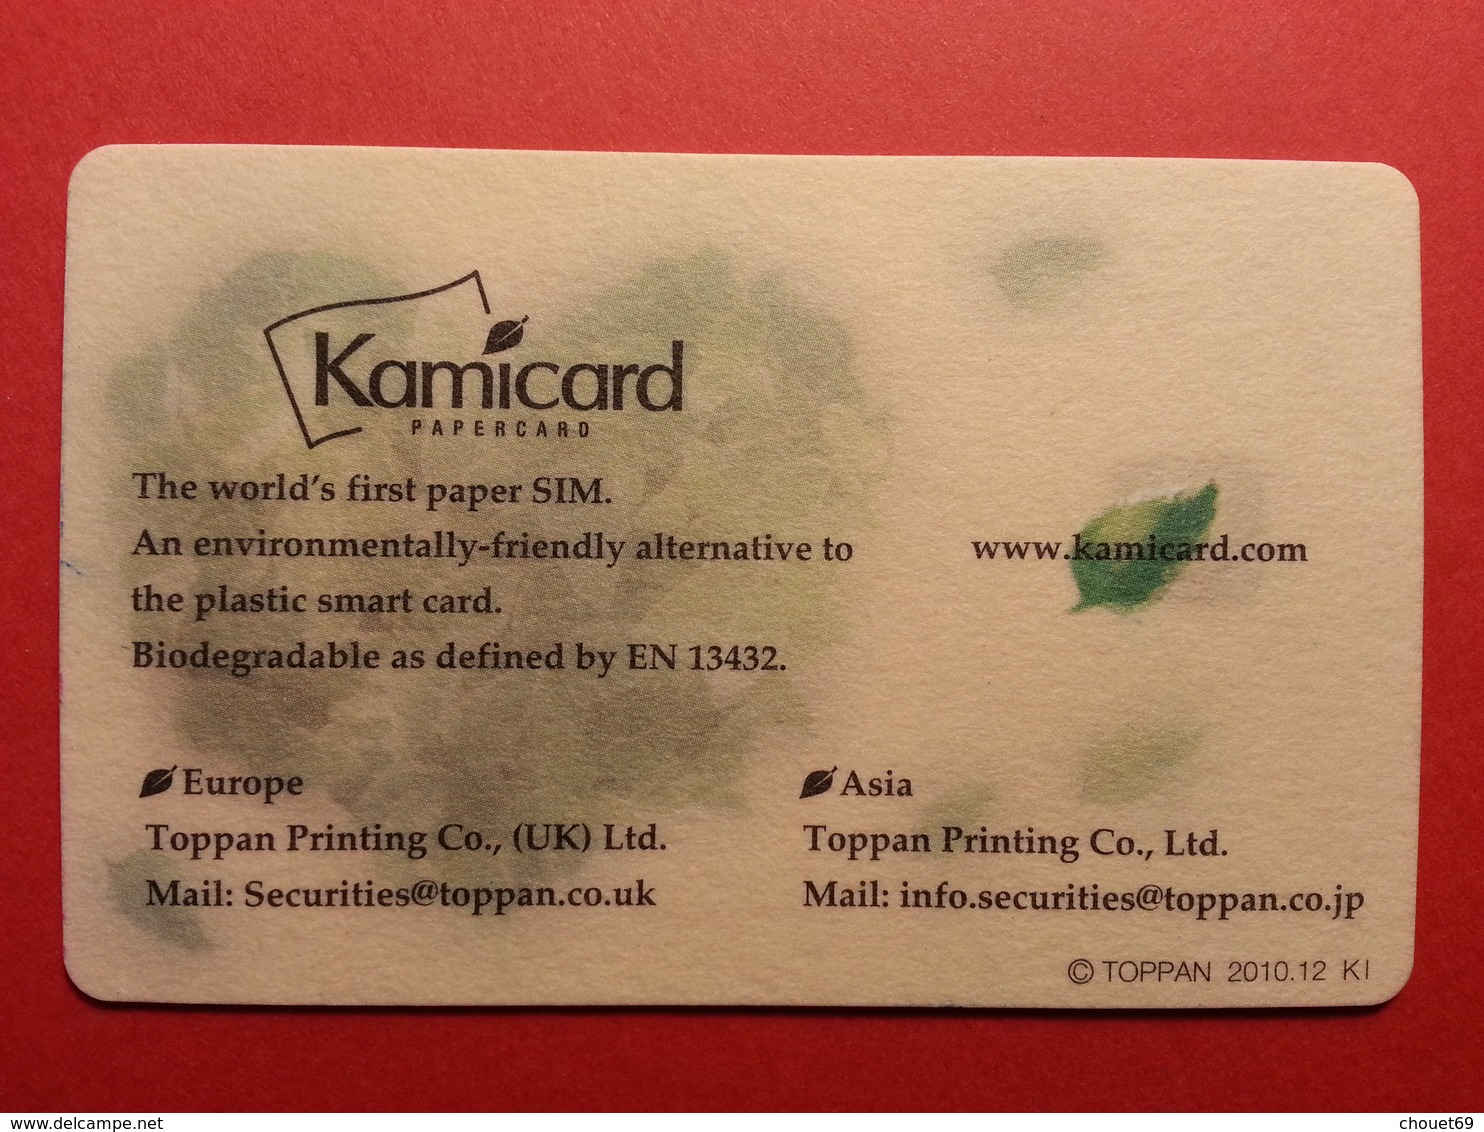 Japon - MUSTER Coeur TOPPAN Paper GSM SIM Kamicard Mint DEMO TEST TRIAL (SACROC) - Japon